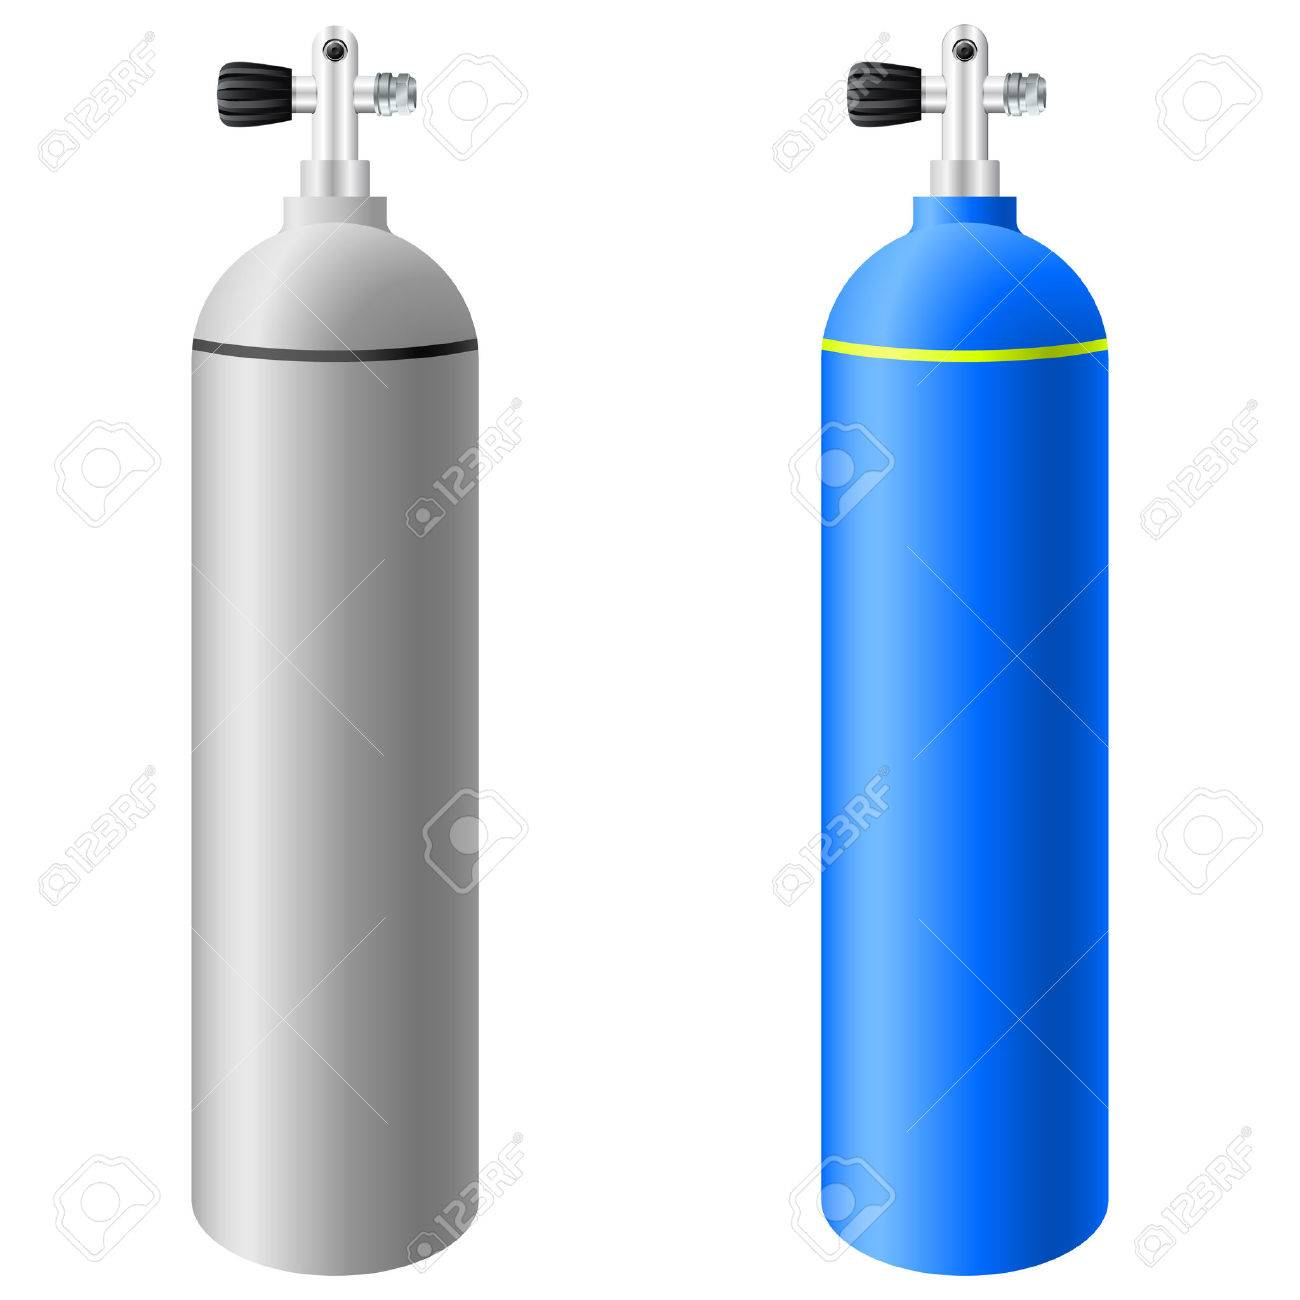 Scuba Tank Clipart Scuba Tanks Oxygen Bottle